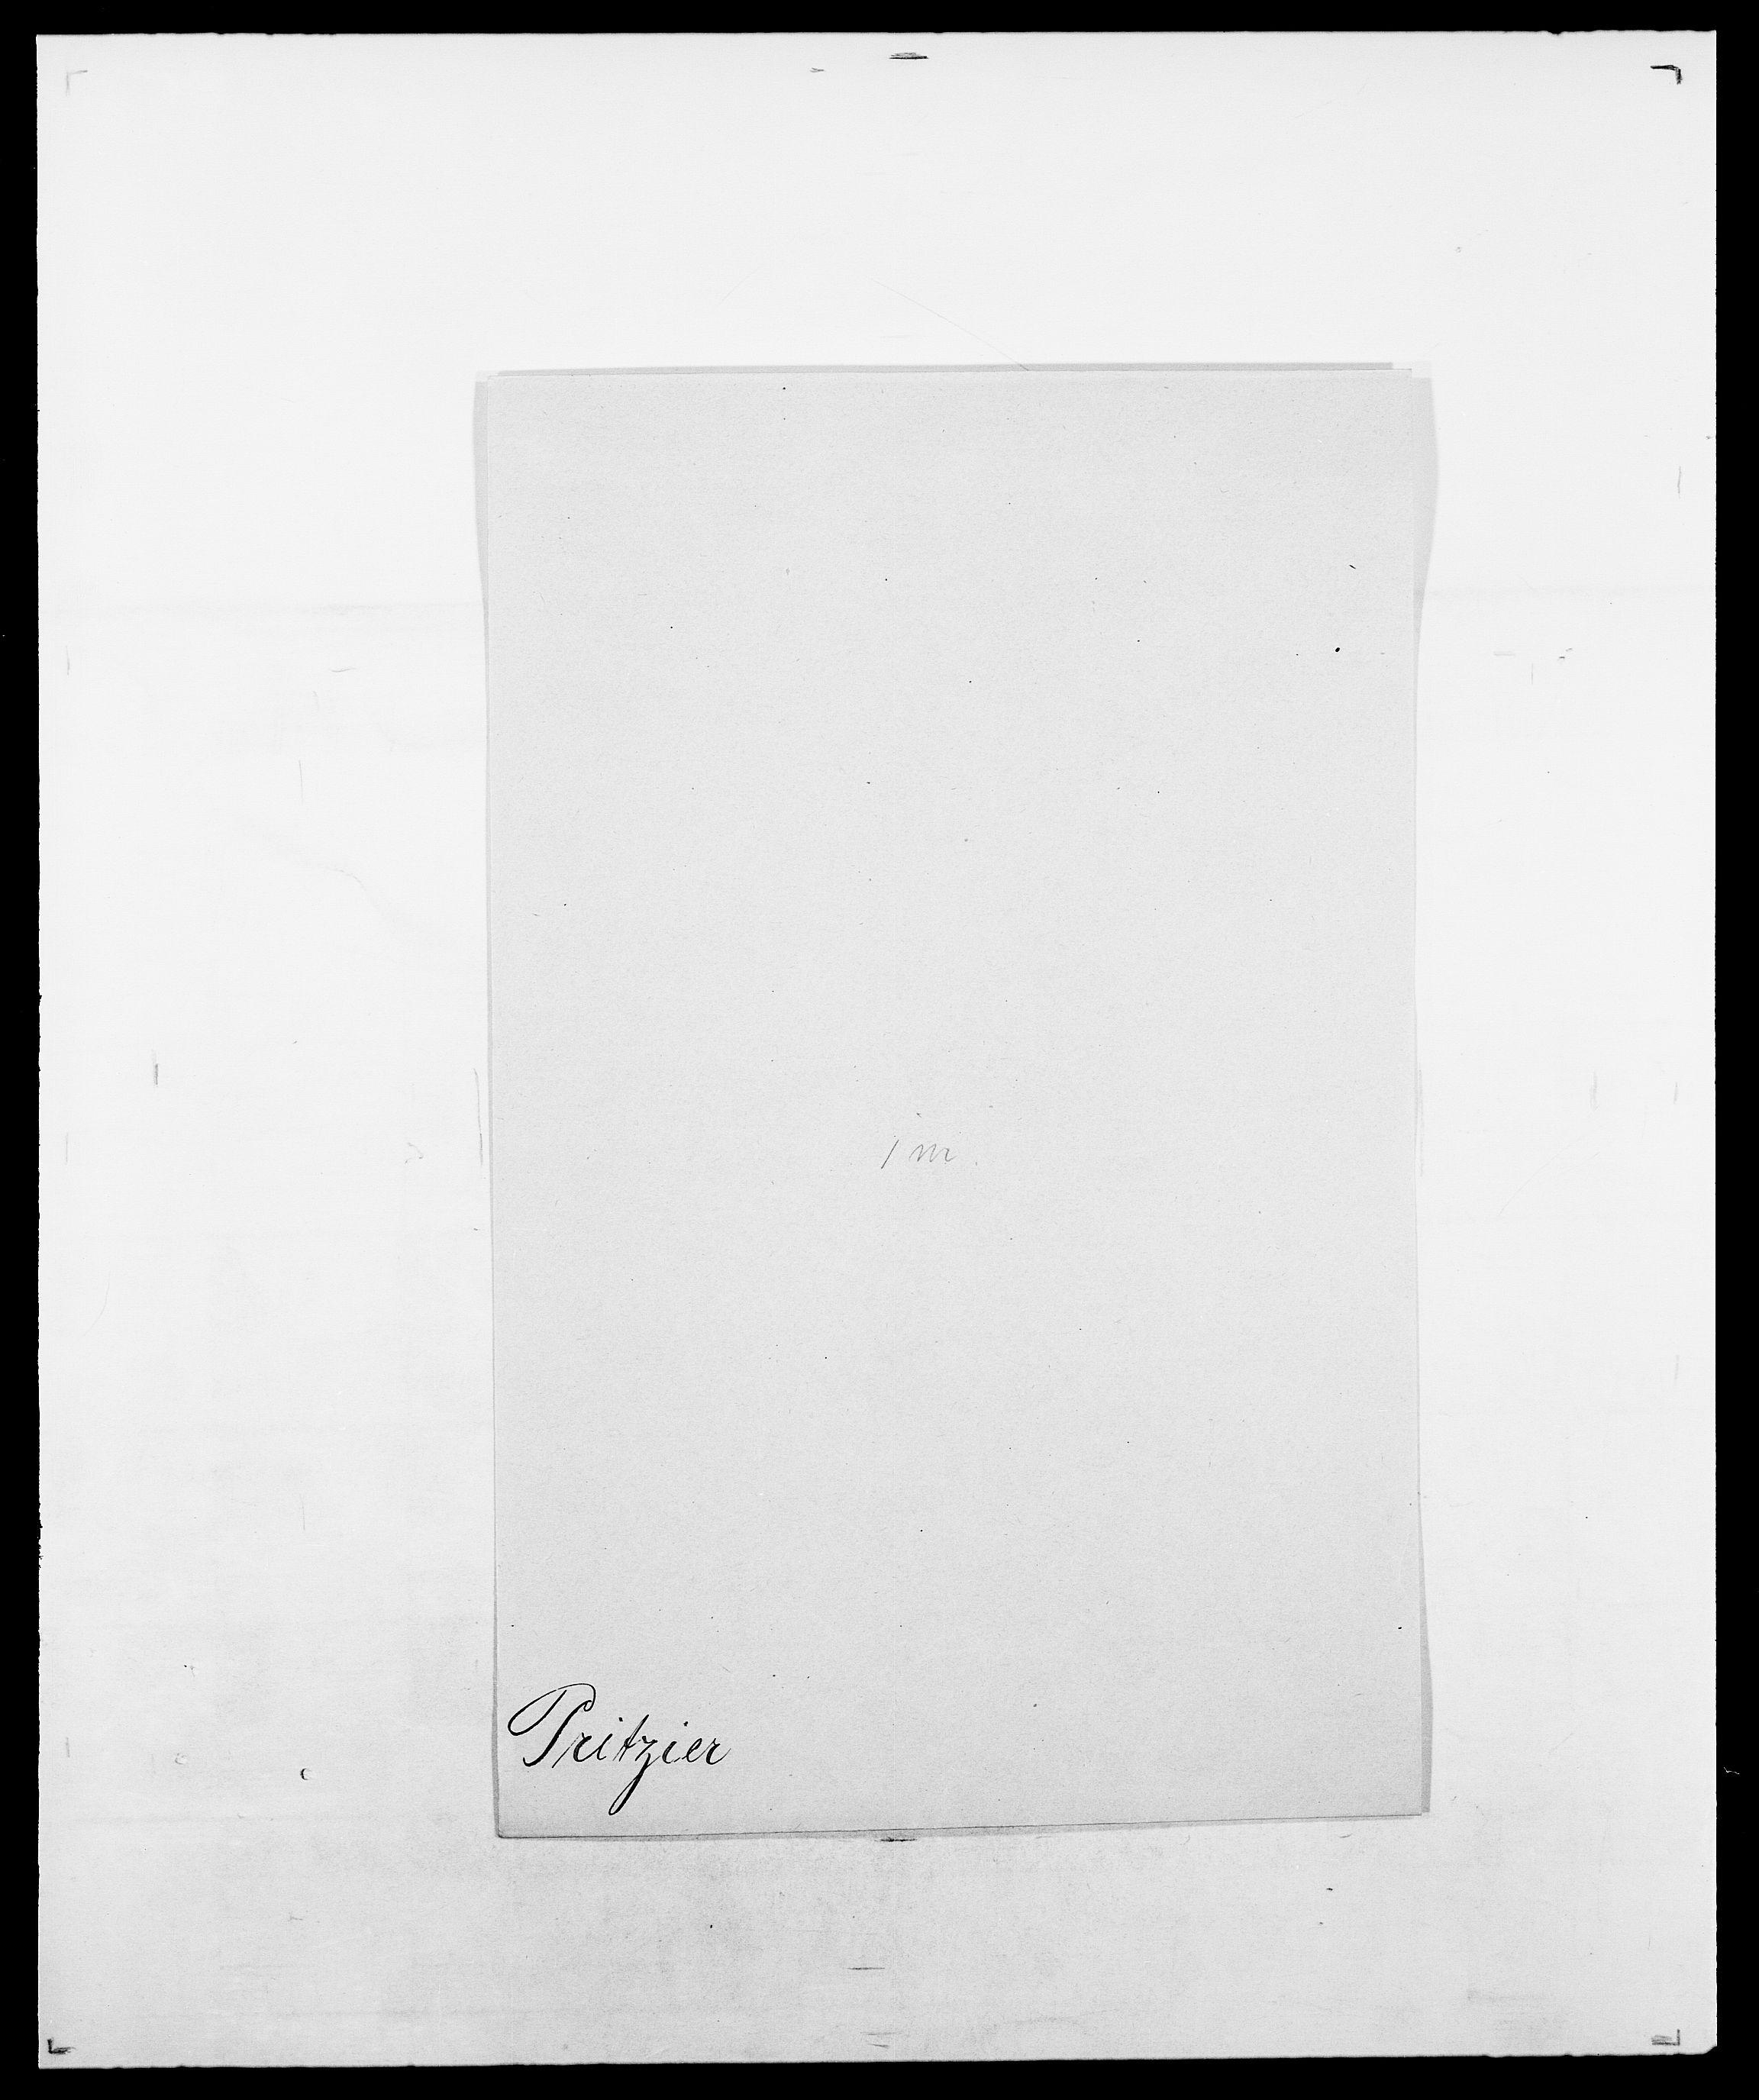 SAO, Delgobe, Charles Antoine - samling, D/Da/L0031: de Place - Raaum, s. 359